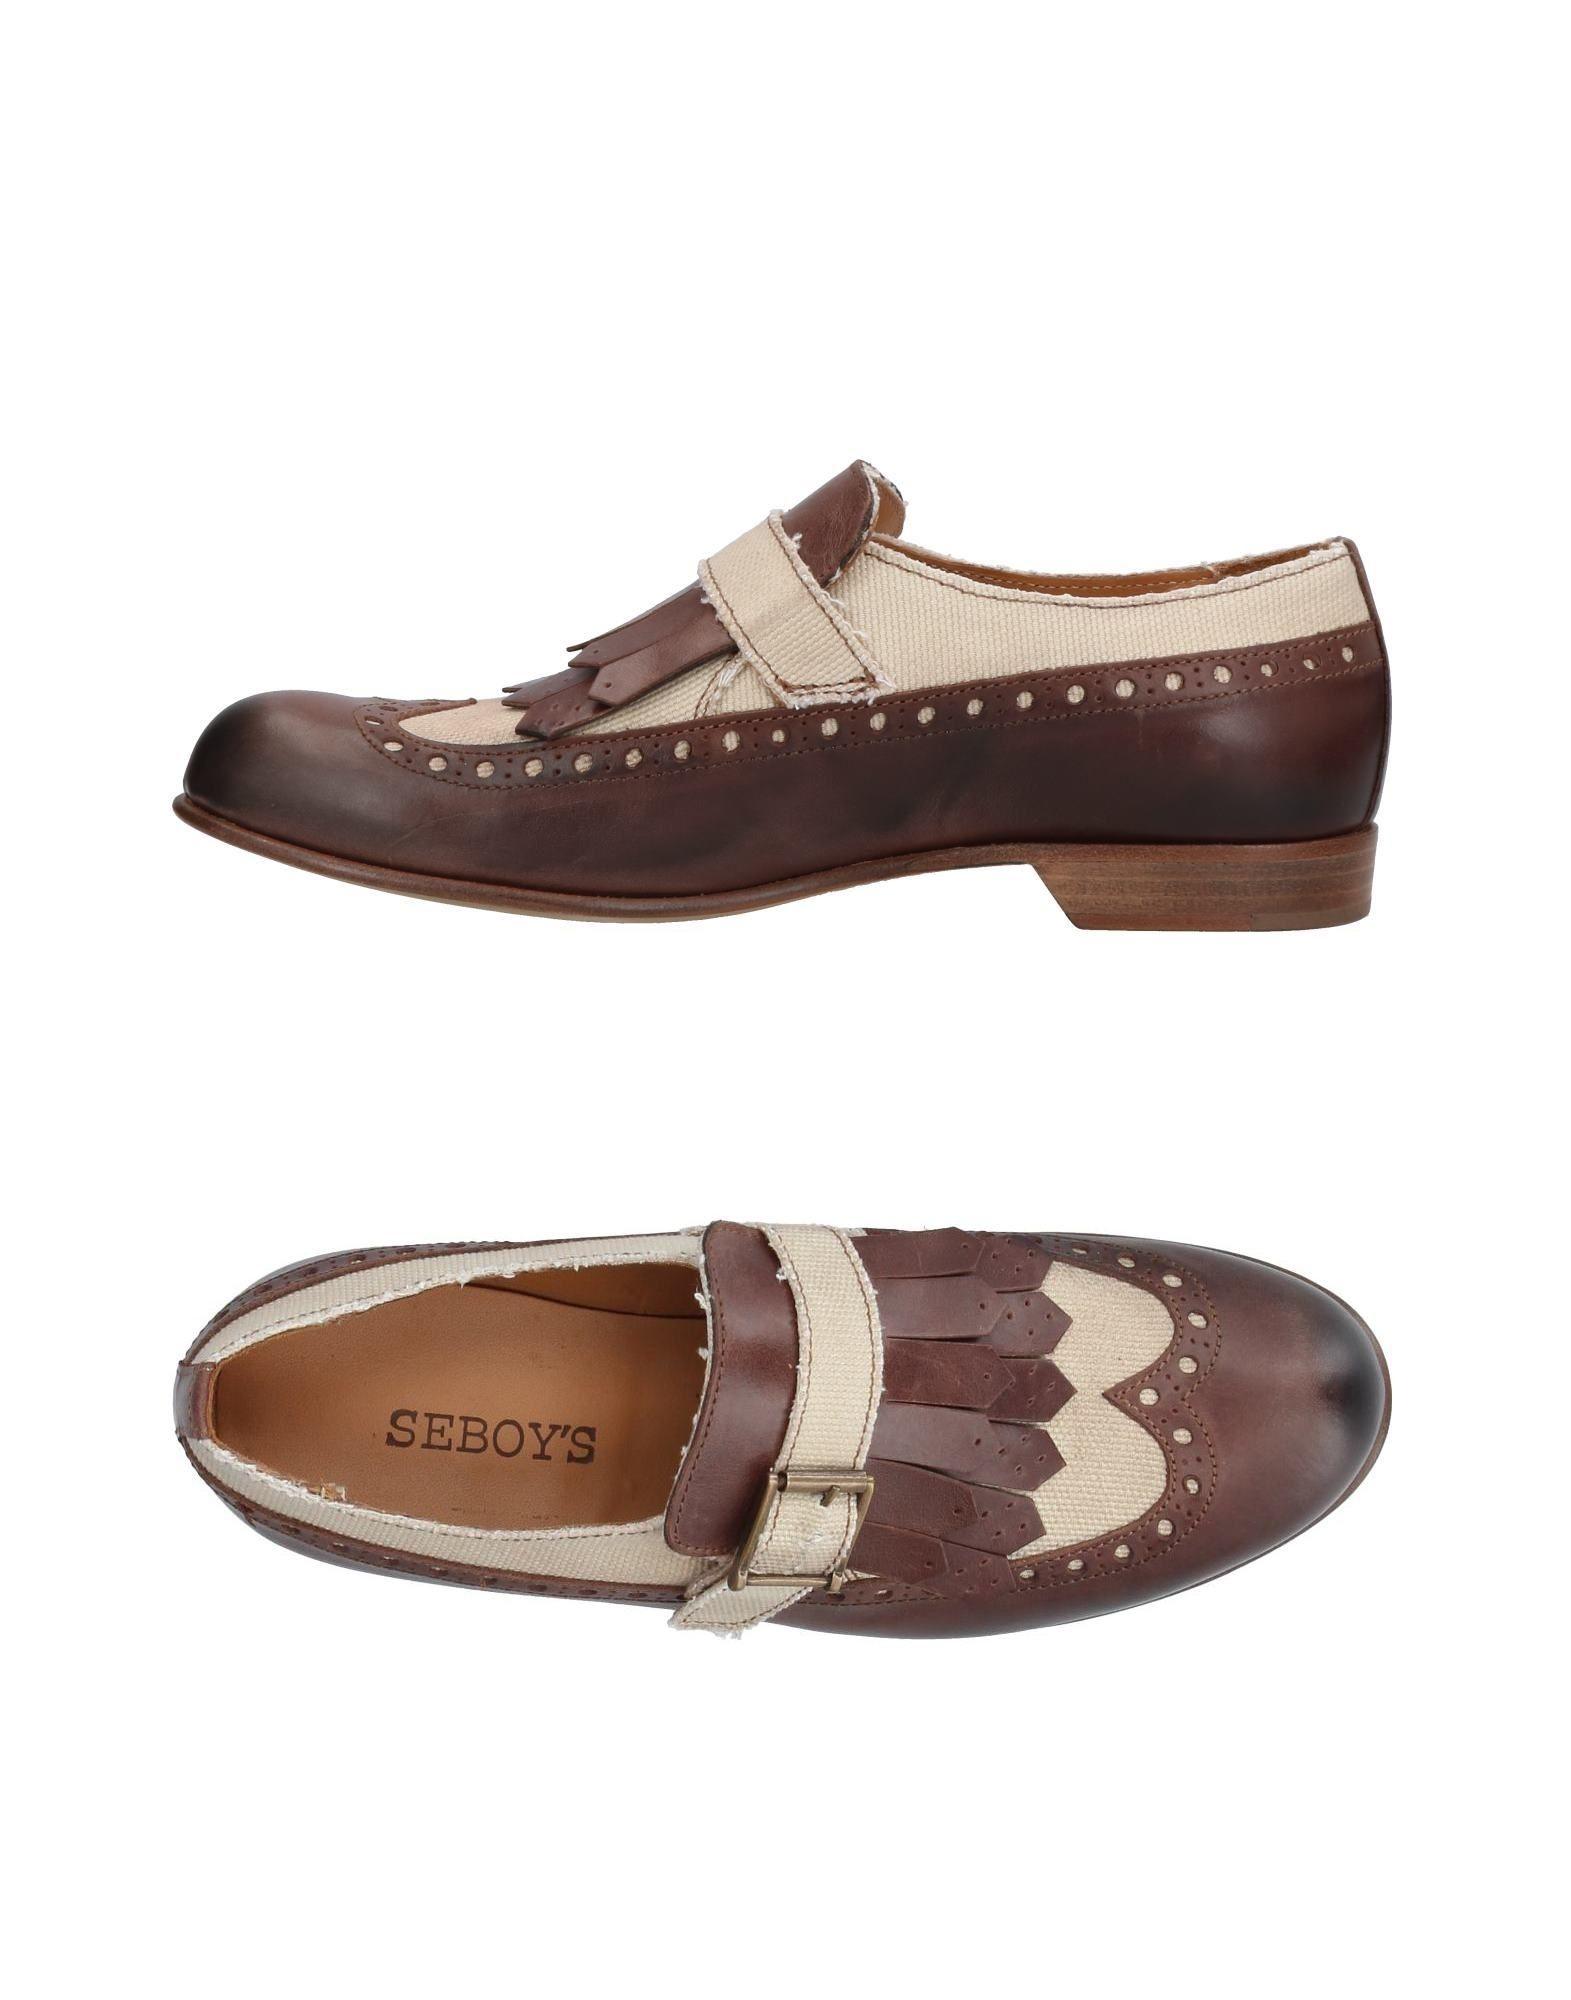 SEBOY'S Обувь на шнурках первый внутри обувь обувь обувь обувь обувь обувь обувь обувь обувь 8a2549 мужская армия green 40 метров